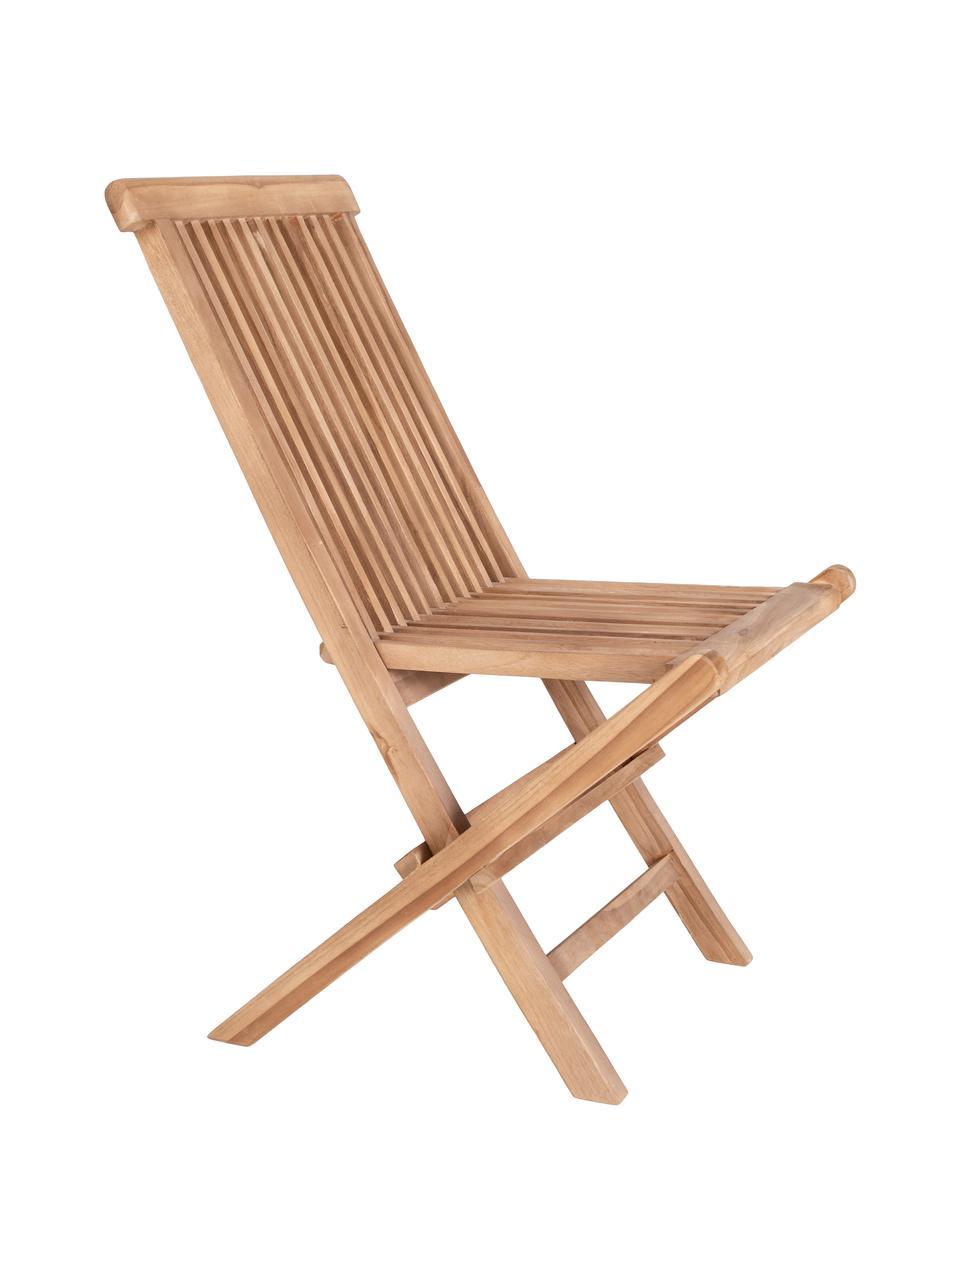 Klappbare Gartenstühle Toledo aus Teakholz, 2 Stück, Teakholz, Teakholz, B 46 cm x T 62 cm